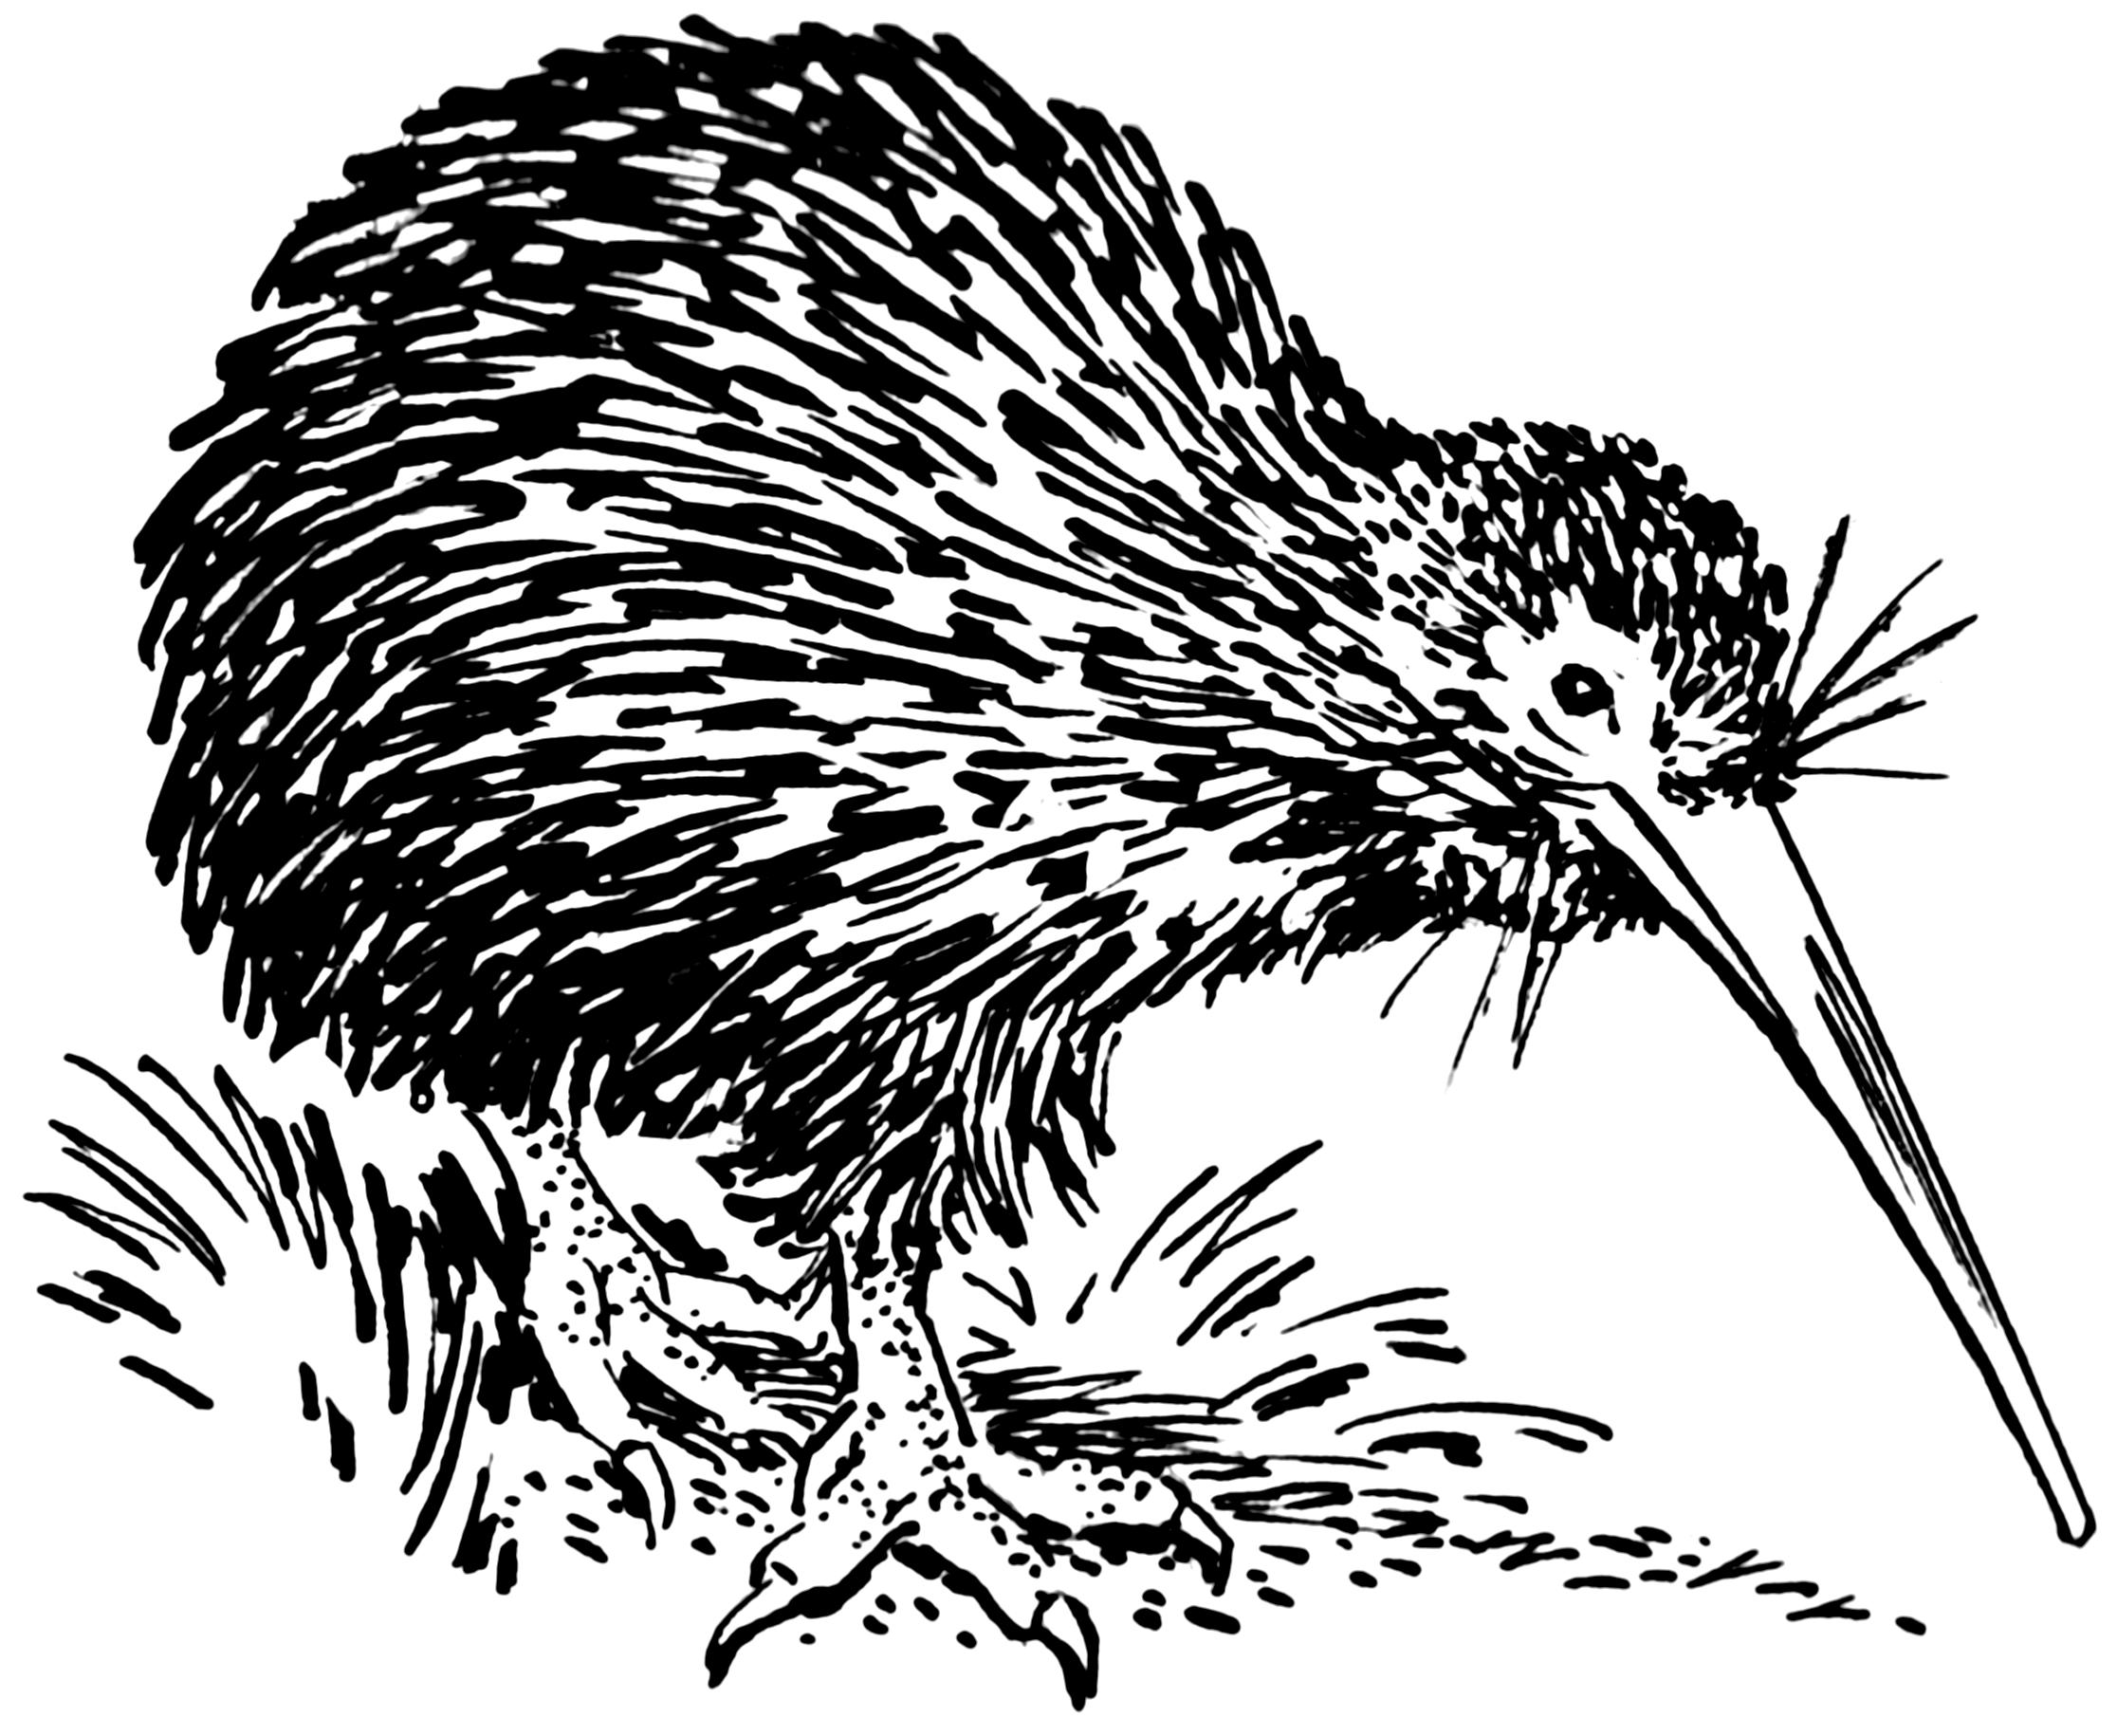 Line Drawing Kiwi : File kiwi psf wikimedia commons